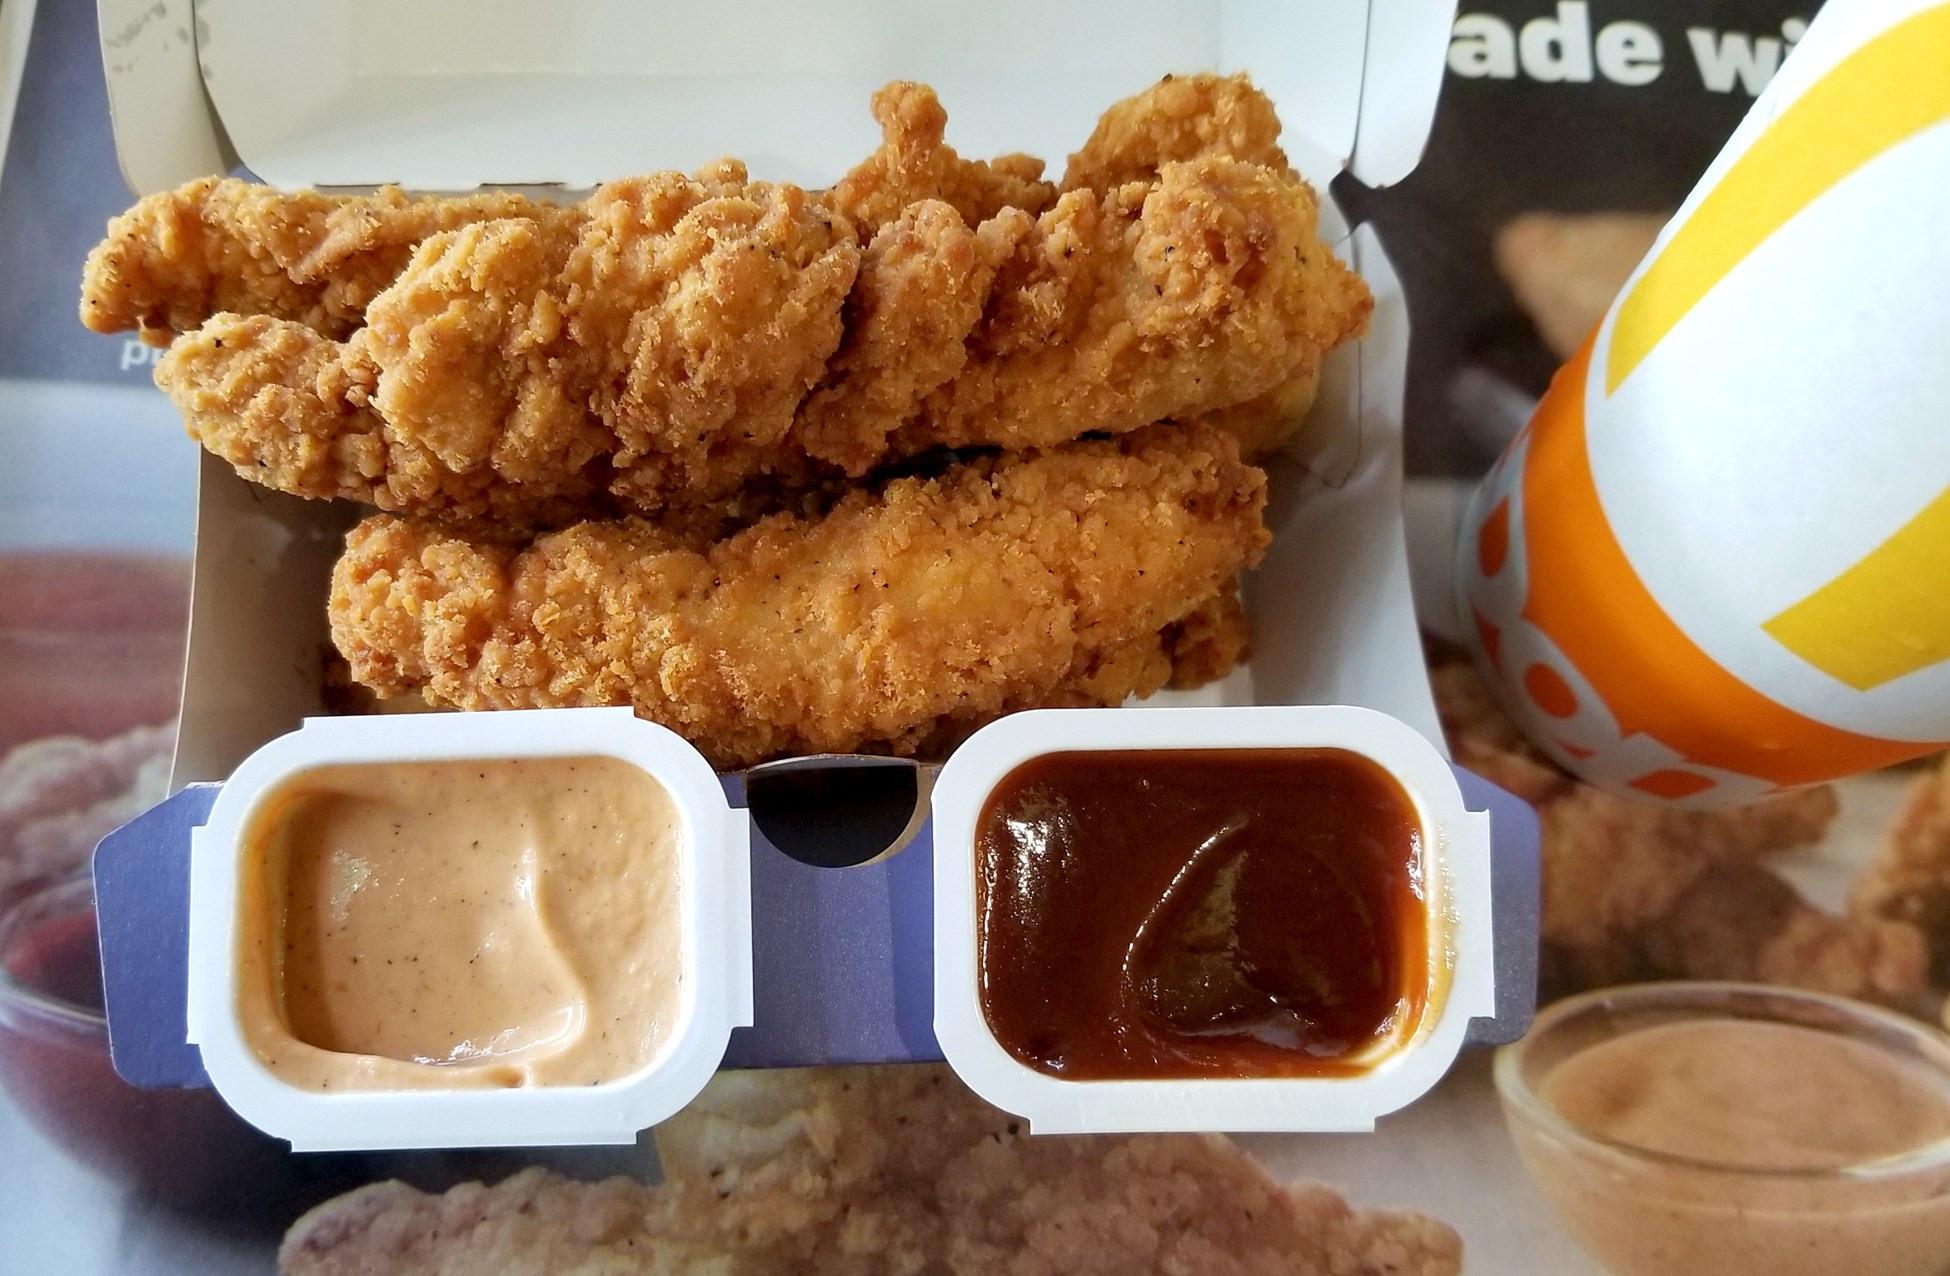 Mcdonalds Chicken Tenders Price  Review McDonald's New Buttermilk Crispy Tenders – Tasty